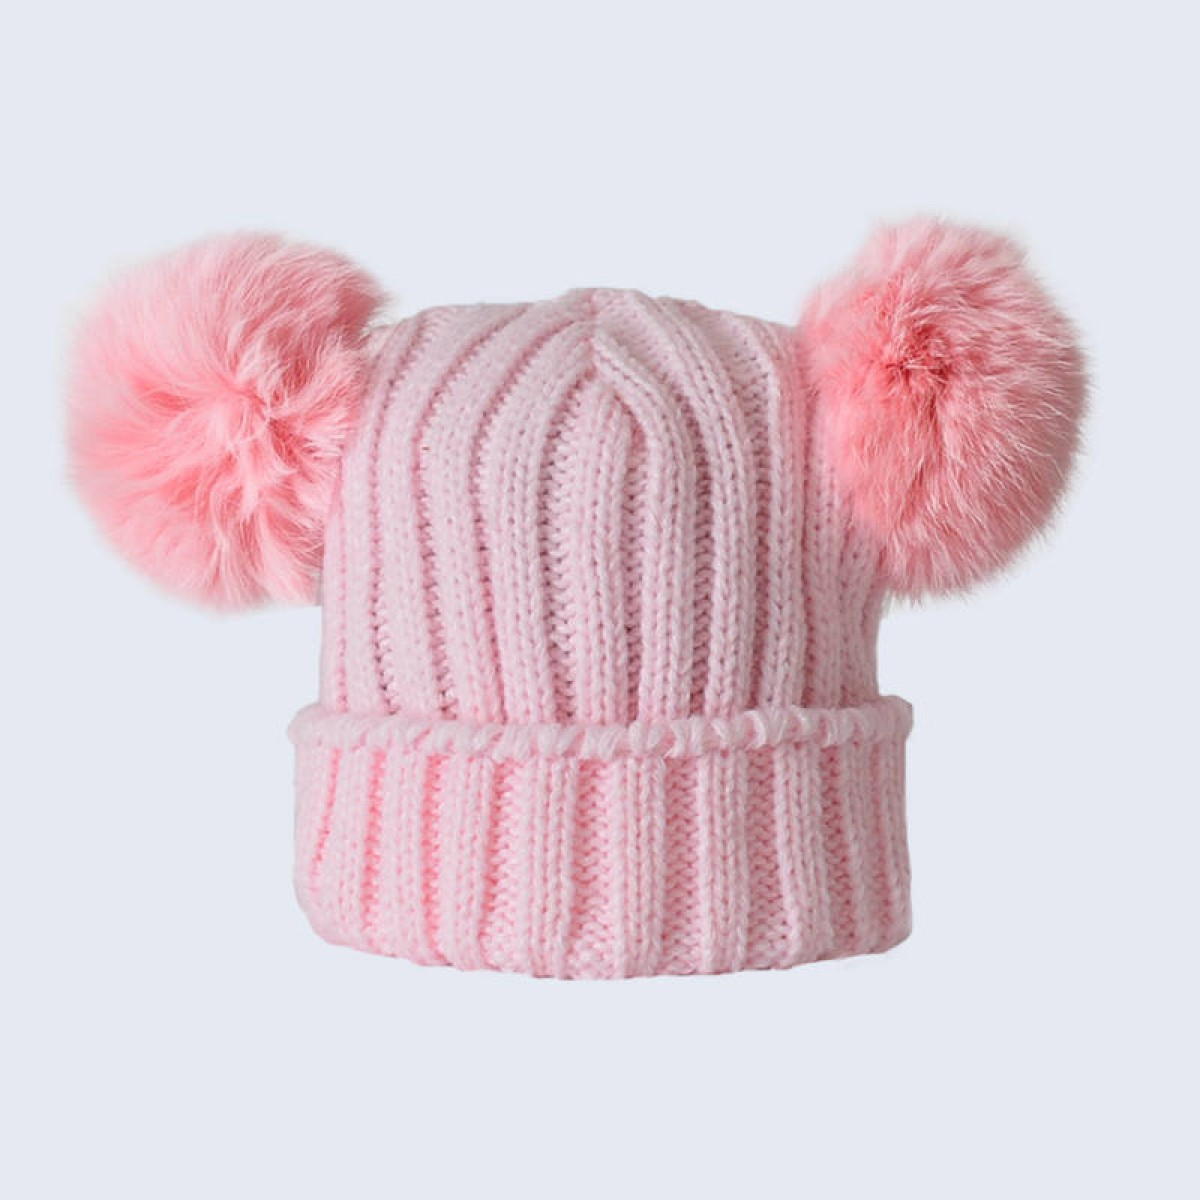 2ea7acb21f7 Amelia Jane London Tiny Tots Pink Double Fur Pom Pom Hat